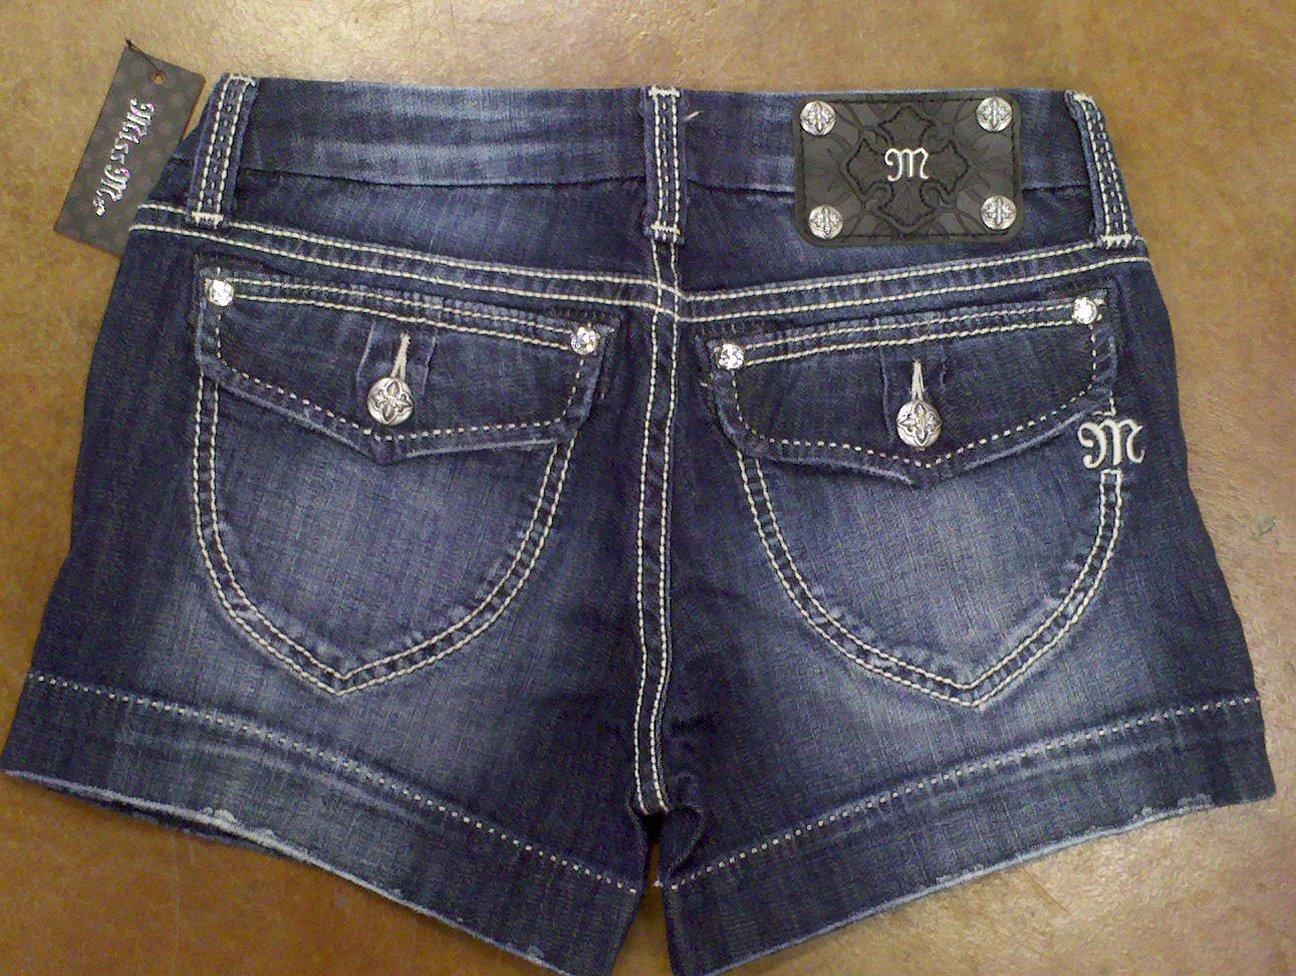 Miss Me Jeans, Capris, Shorts :: McGregor General Store